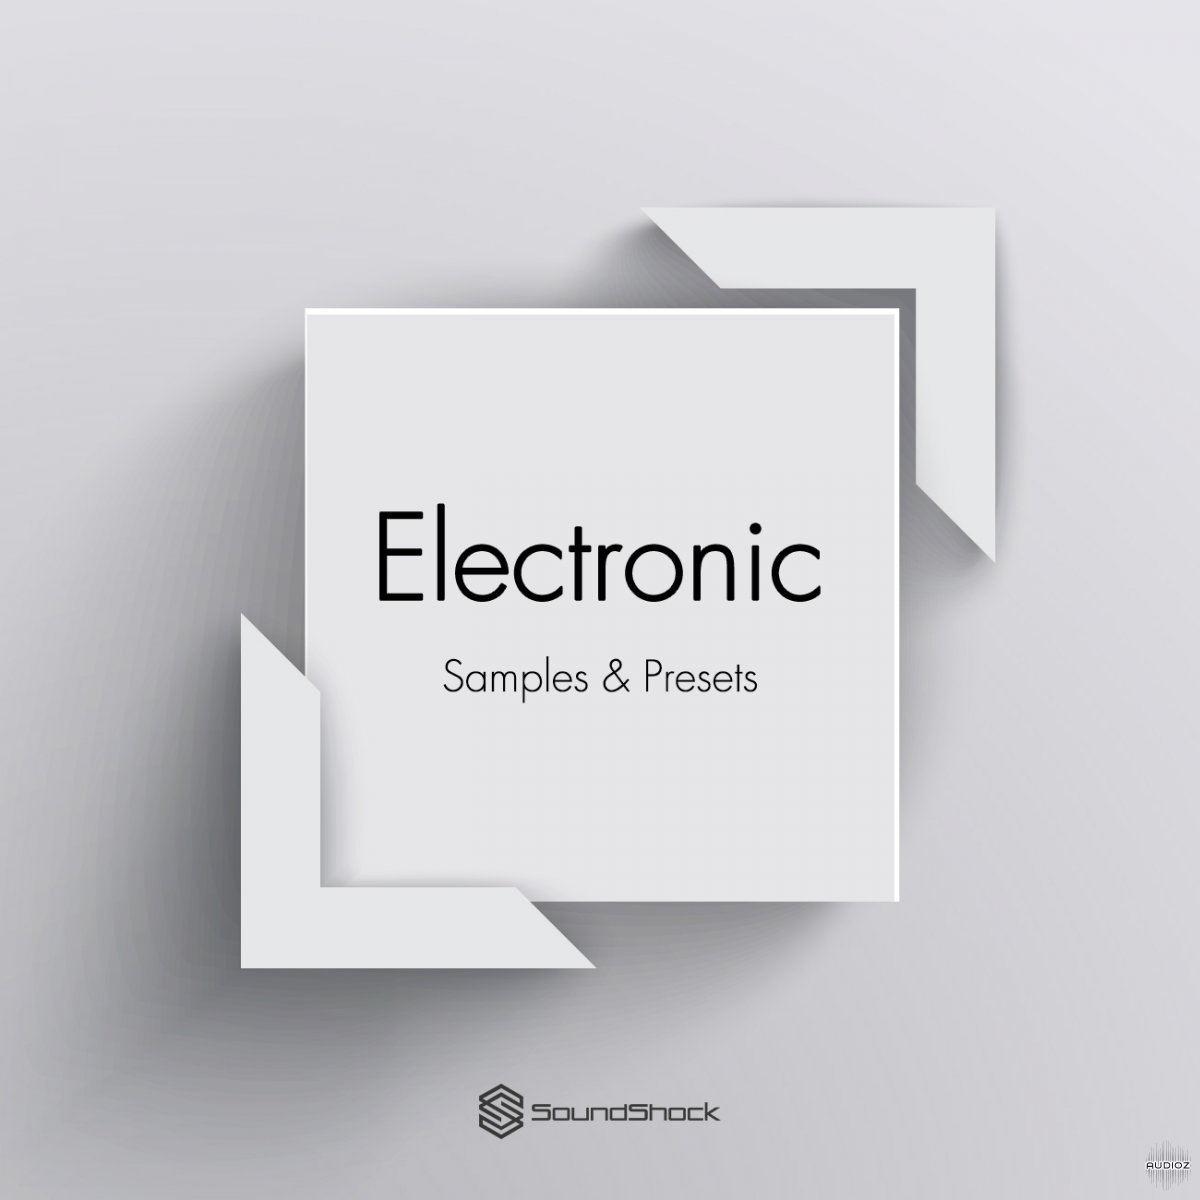 Download SoundShock Electronic Samples & Serum Presets [FREE